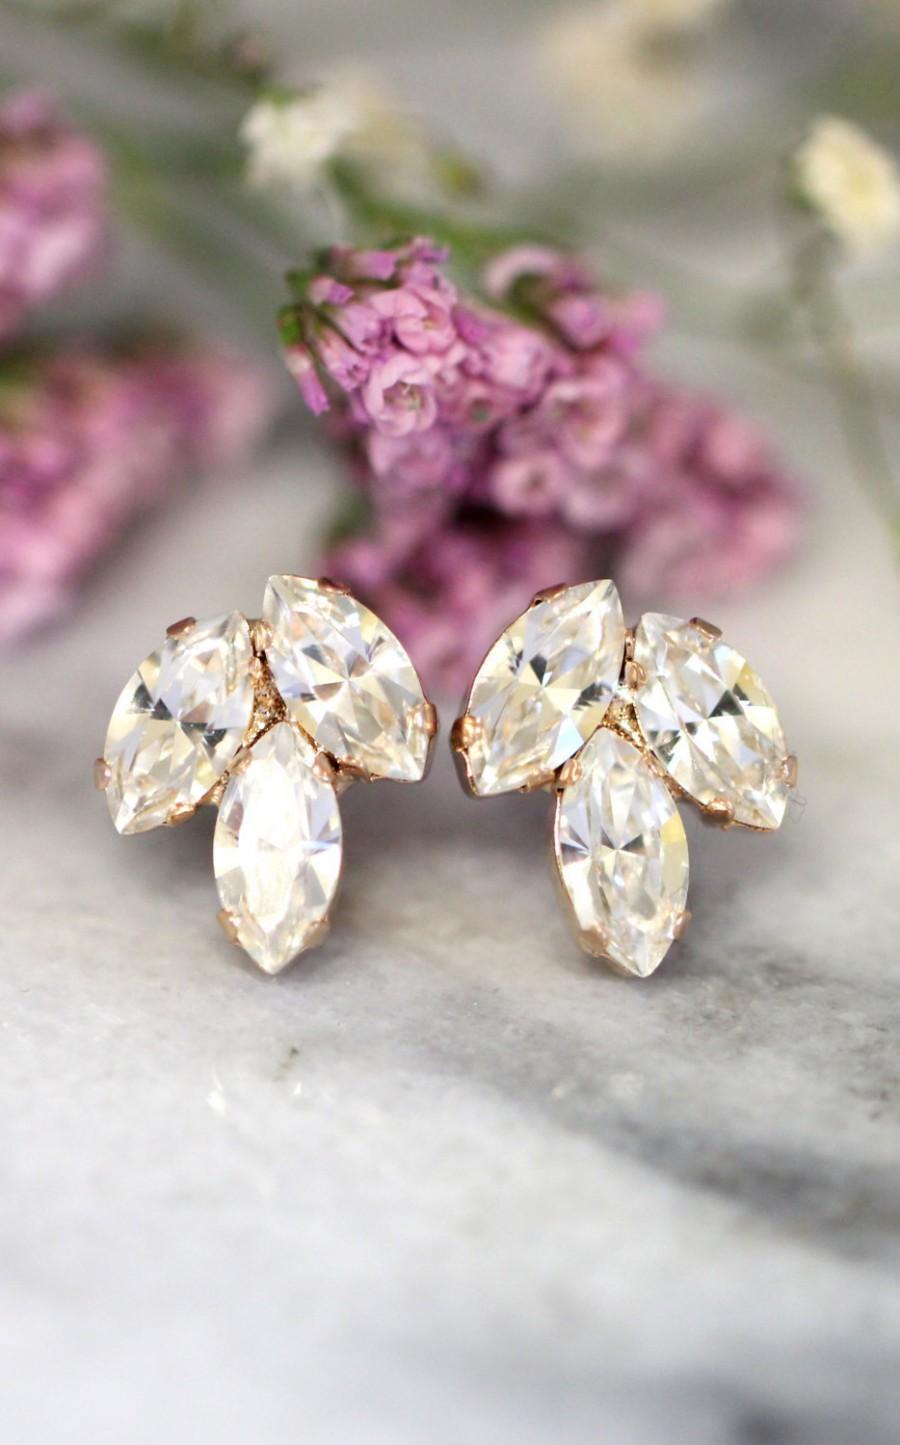 Mariage - Bridal Crystal Earrings,Swarovski Bridal Crystal Earrings,Bridal Cluster Earrings,Bridesmaids Earrings,Crystal Bridal Earrings,Crystal Studs